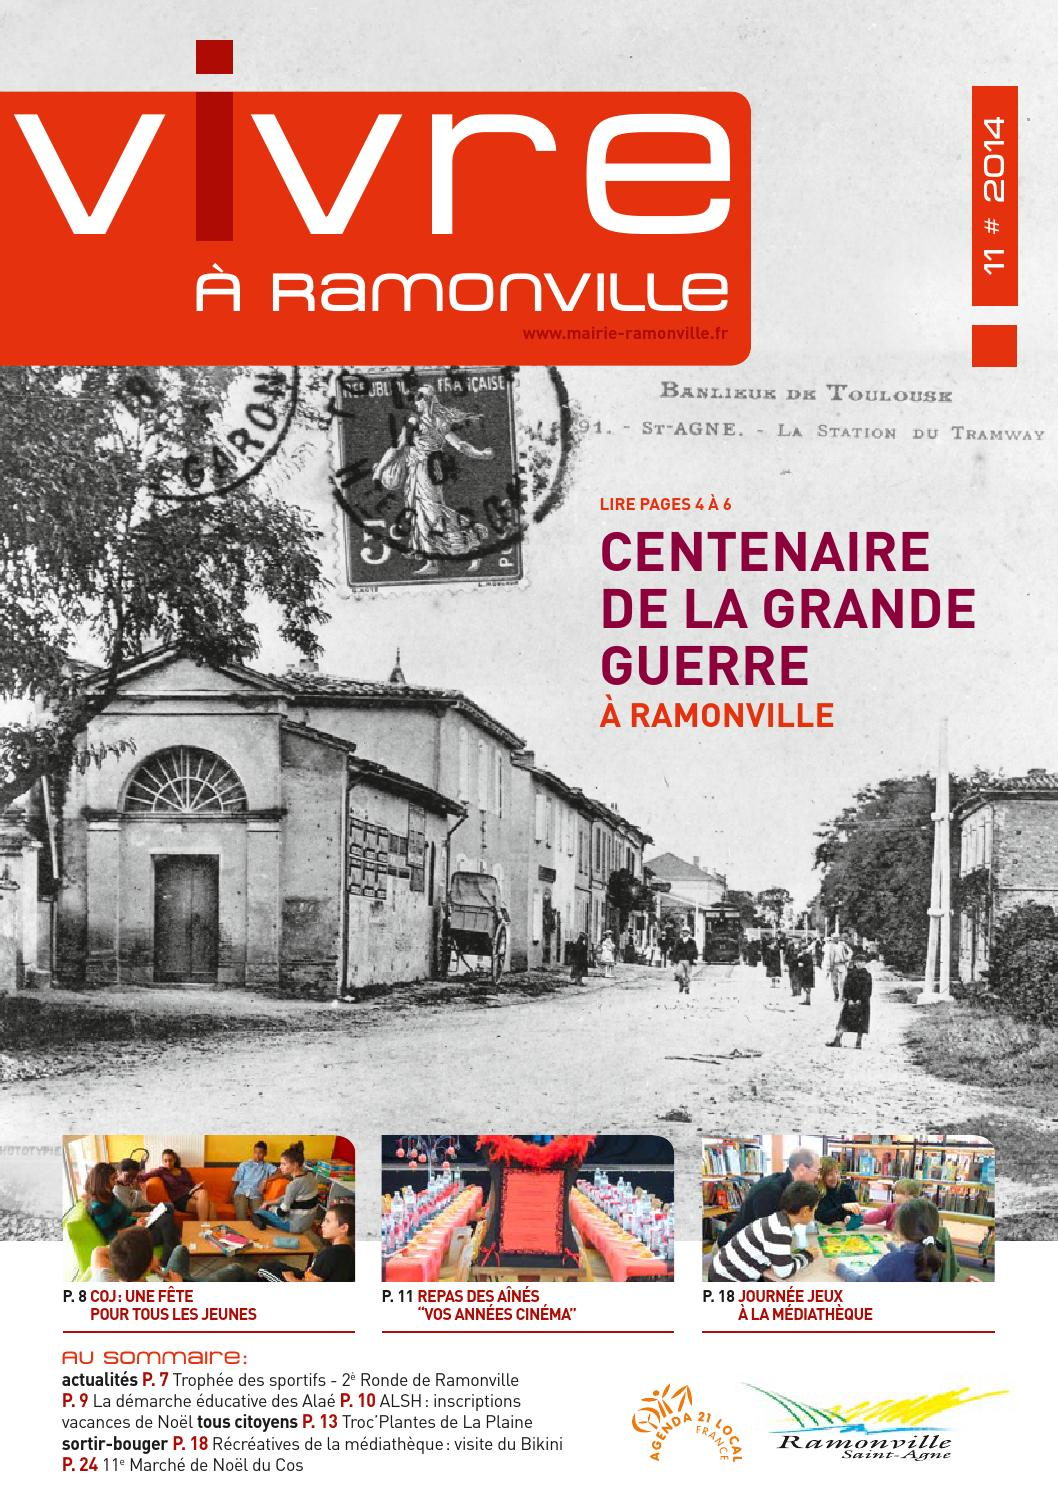 By Ramonville Agne 2014 De Var Issuu Mairie Novembre Saint 0XPOkw8n